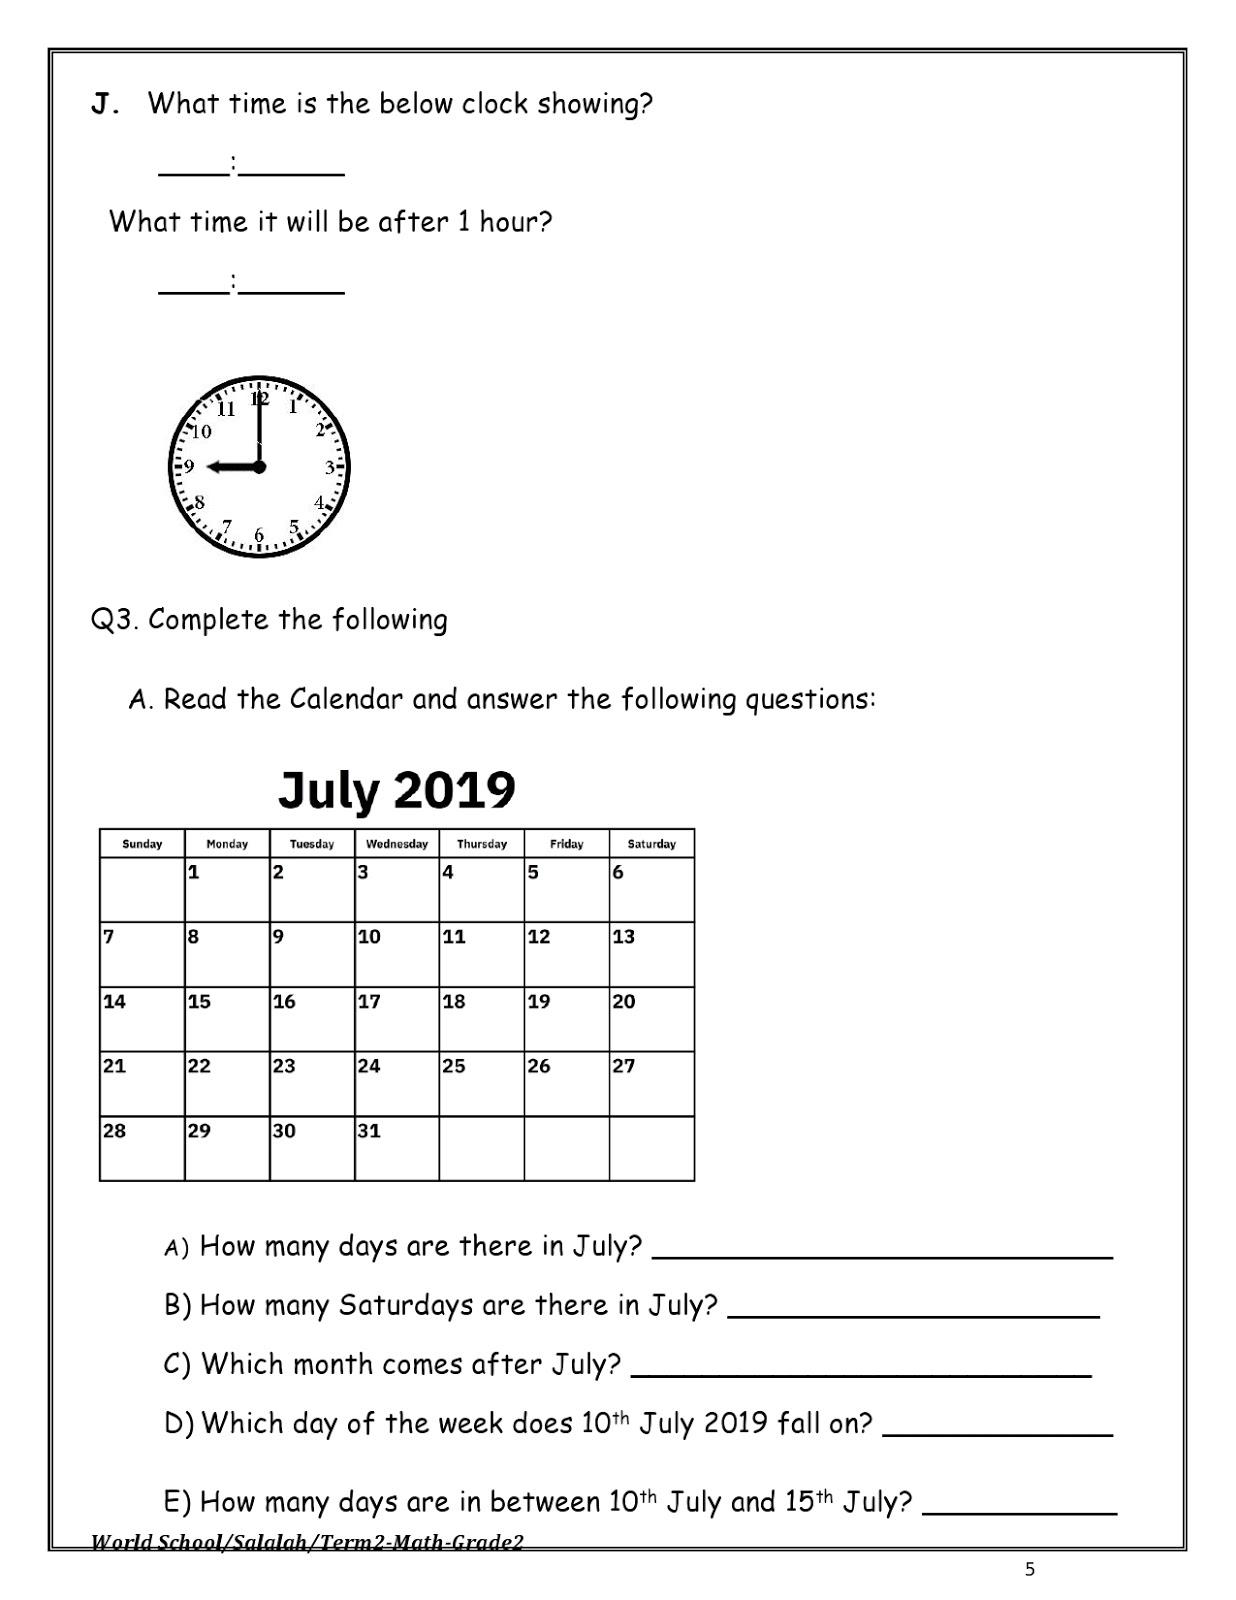 Birla World School Oman Revision Worksheets For Grade 2 As On 09 05